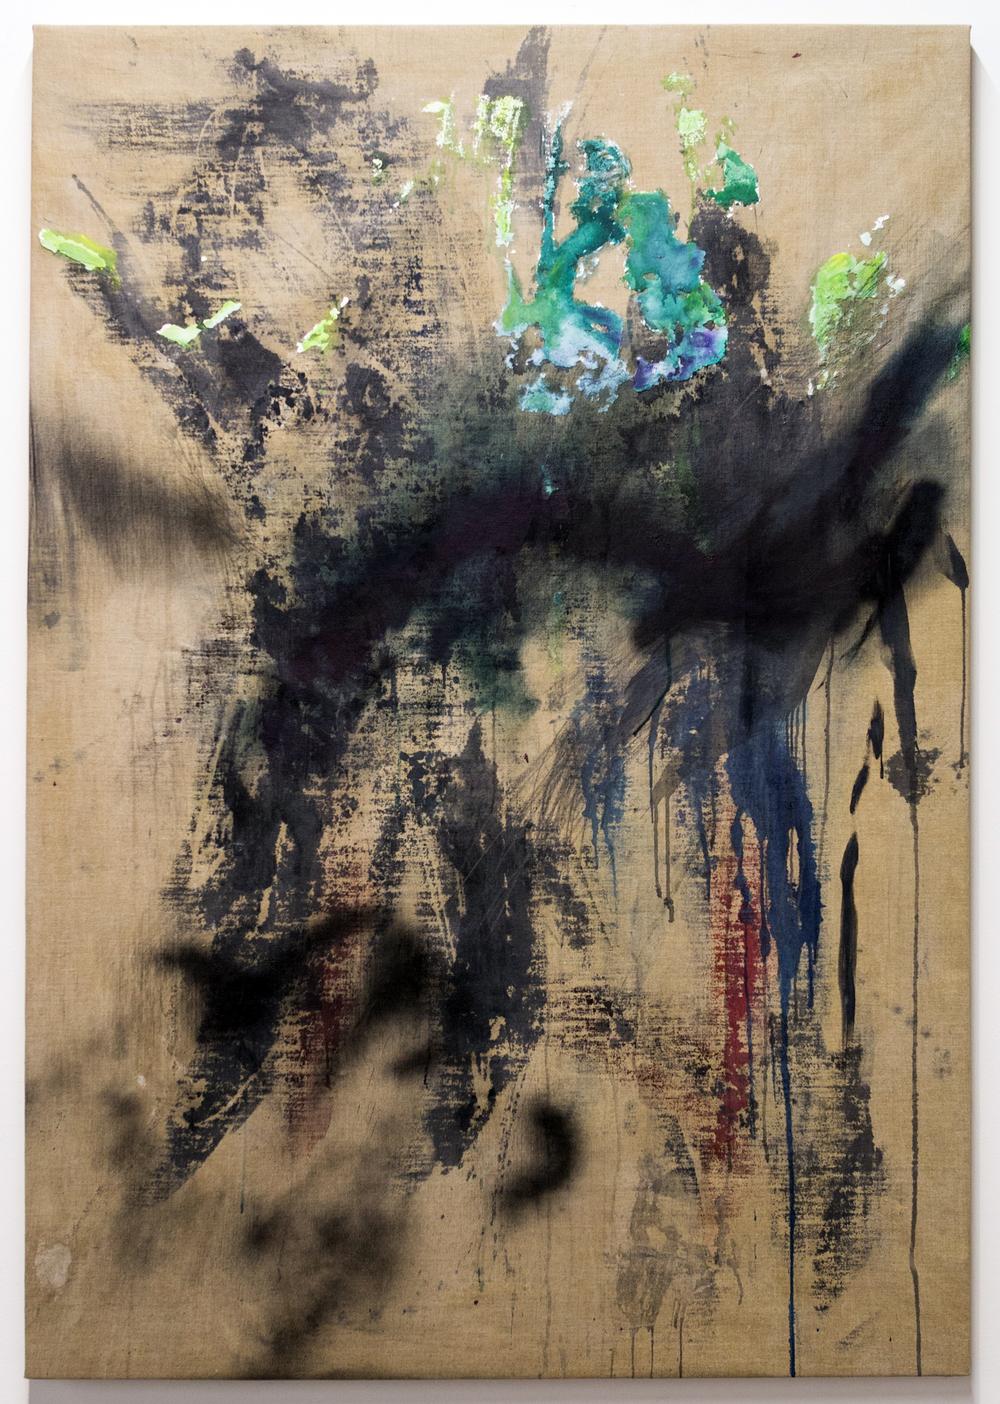 MLSL_08_Roxy, 2015 Oil, acrylic, lead and spray paint on linen 67 x 46.5 in (170.18 x 118.11 cm)